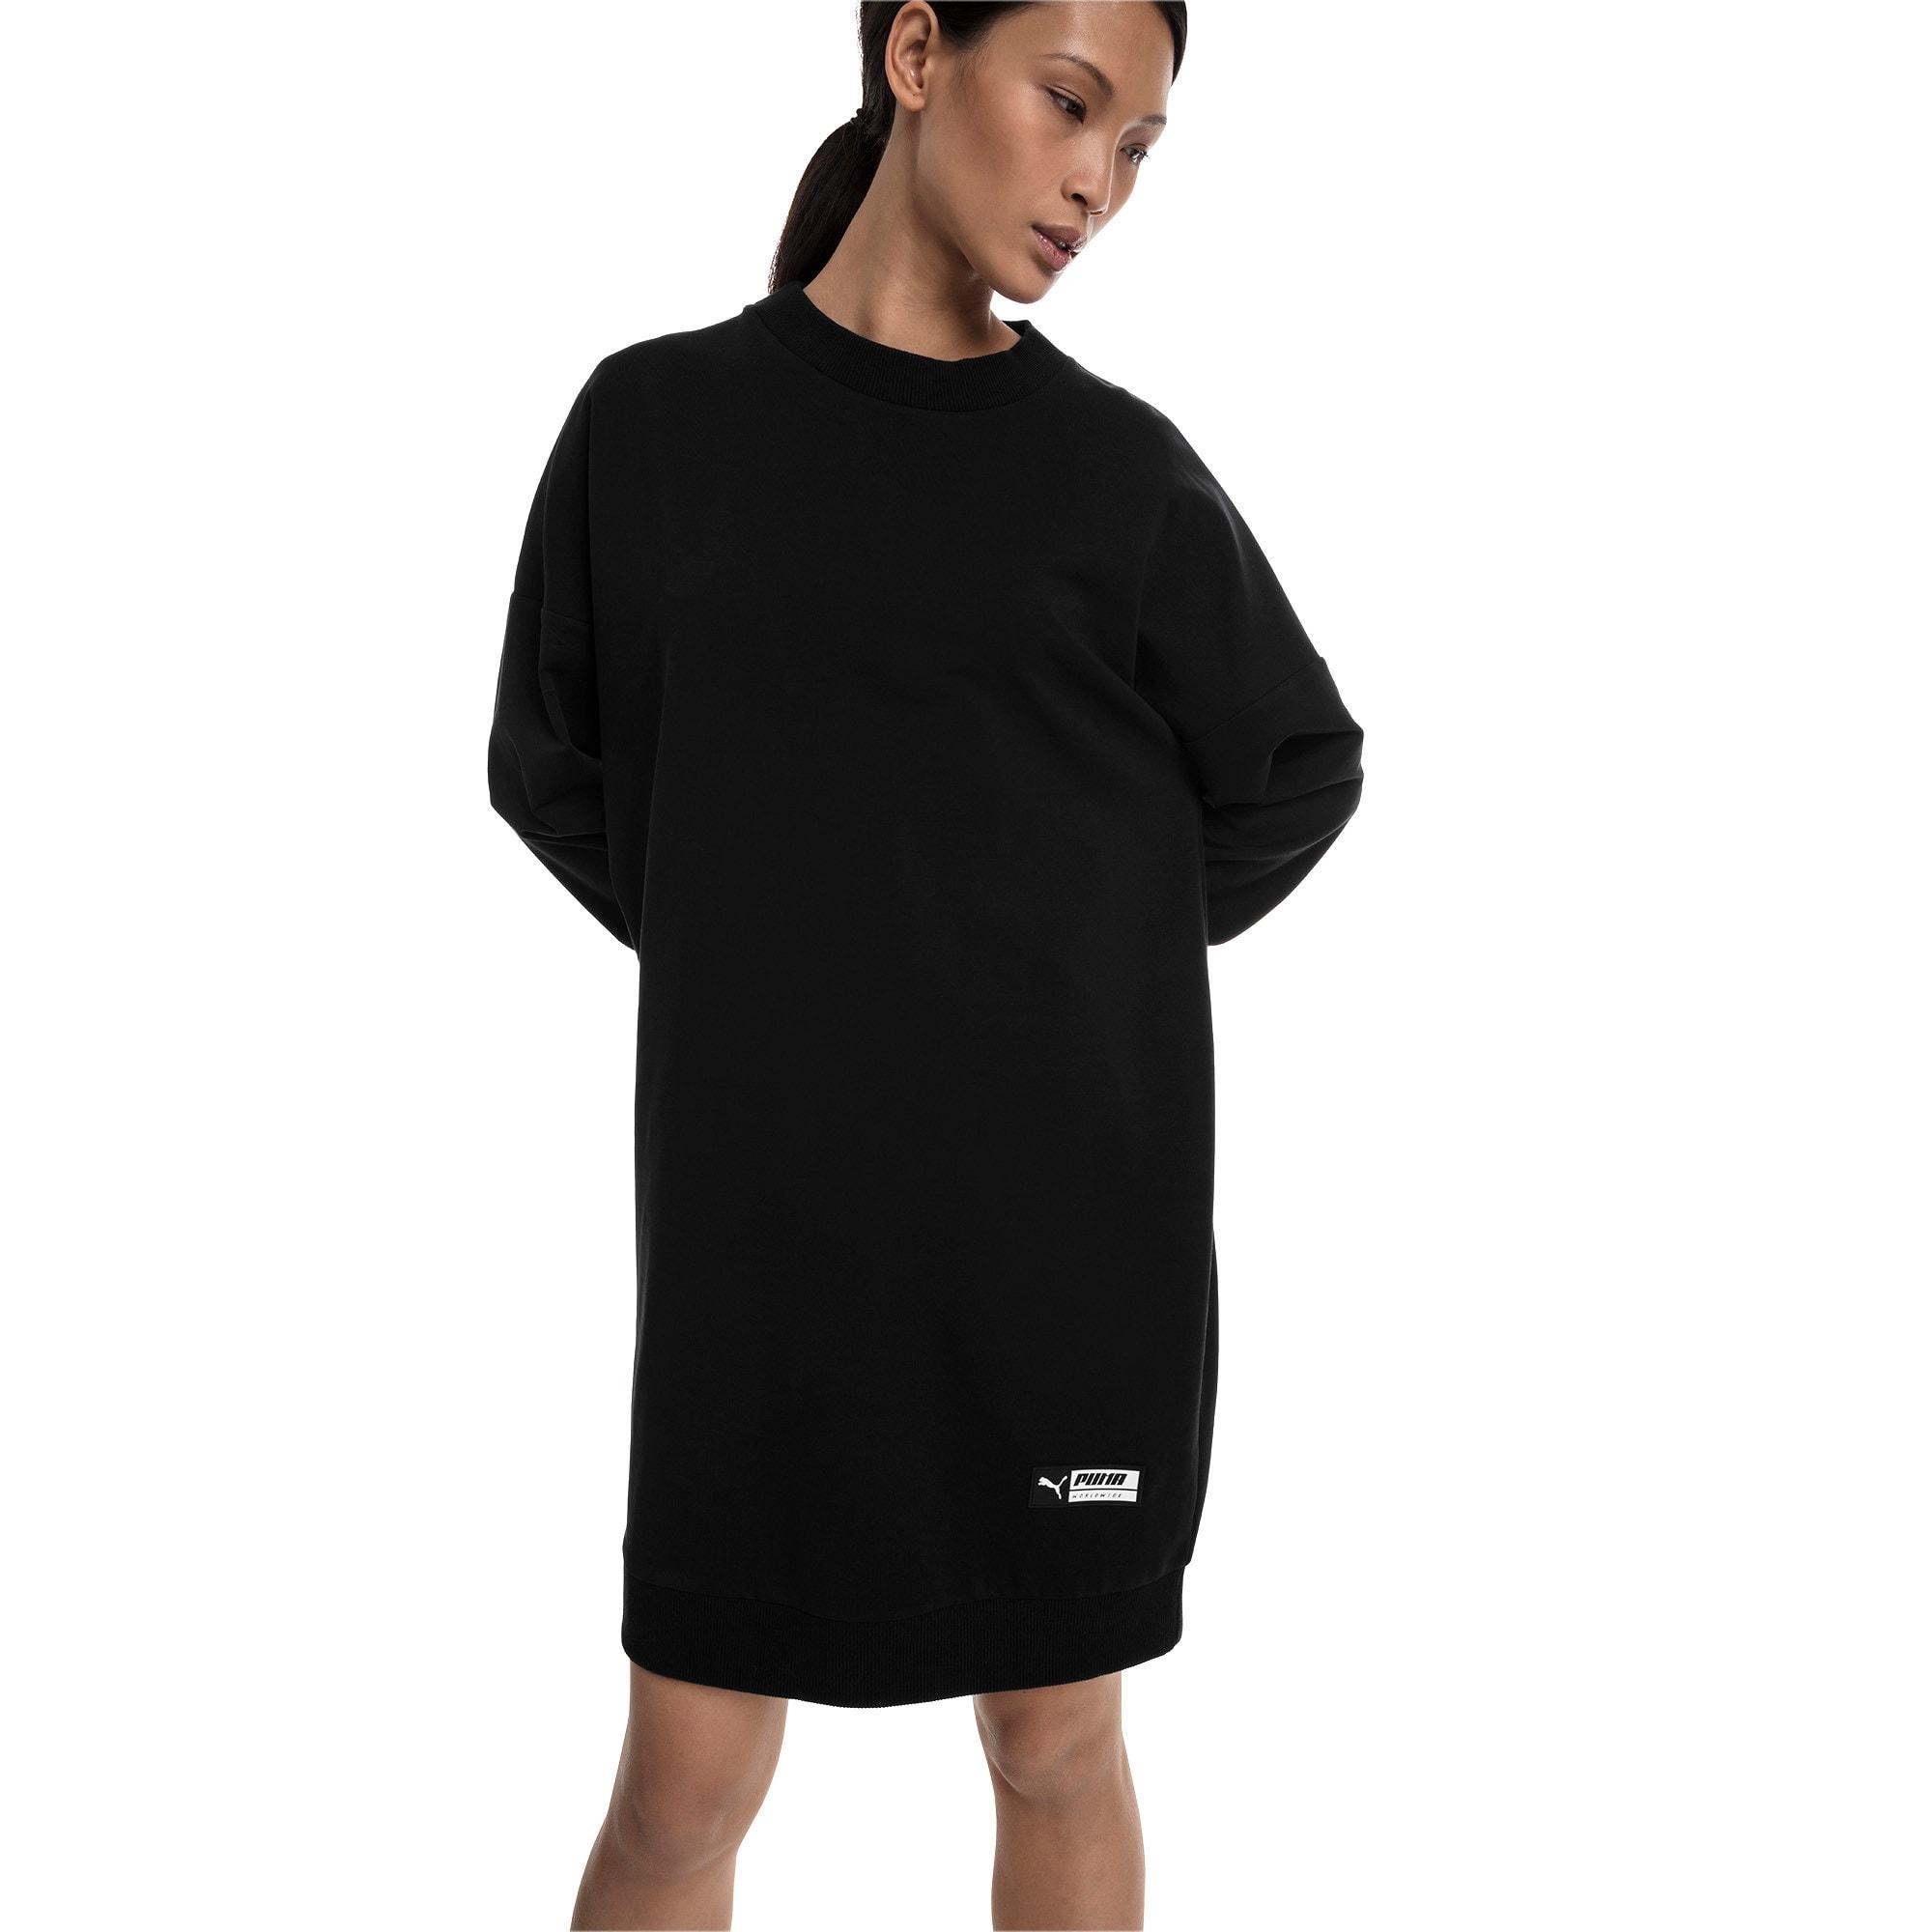 Thumbnail 1 of Trailblazer Women's Long Crewneck Sweatshirt, Cotton Black, medium